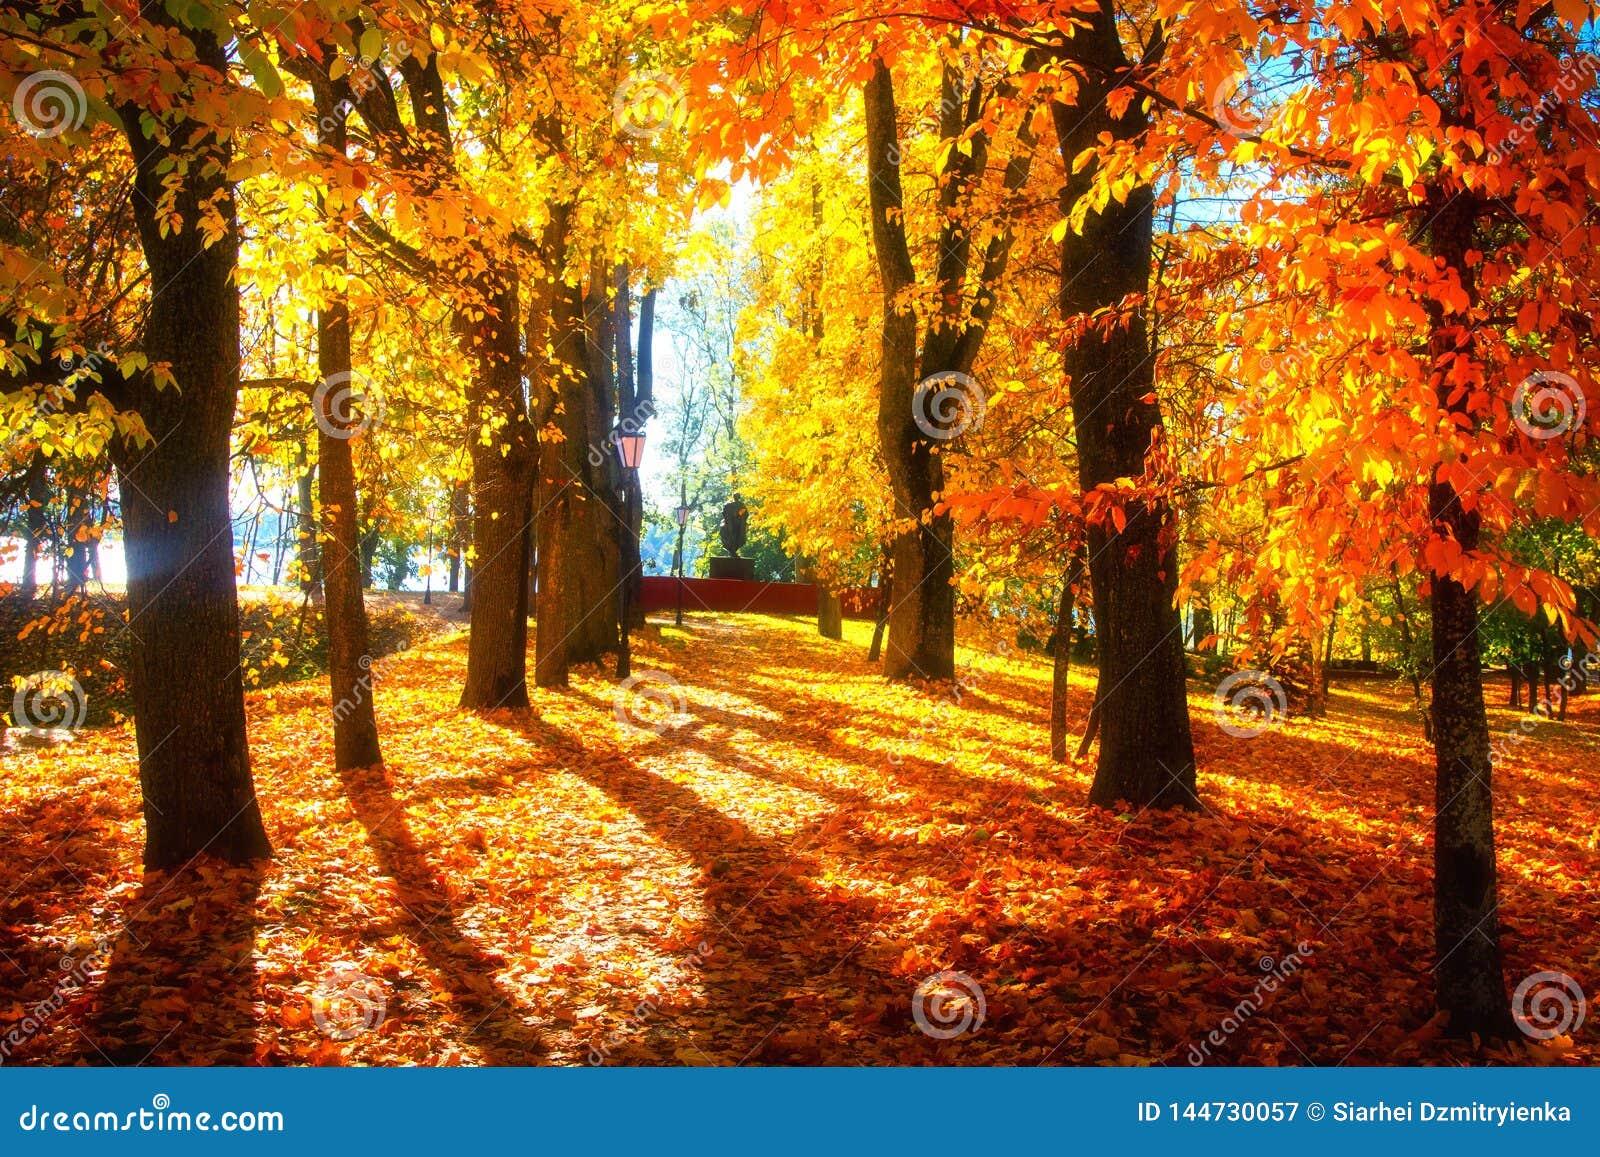 Autumn Scene. Bright Colorful Landscape Yellow Trees In ...